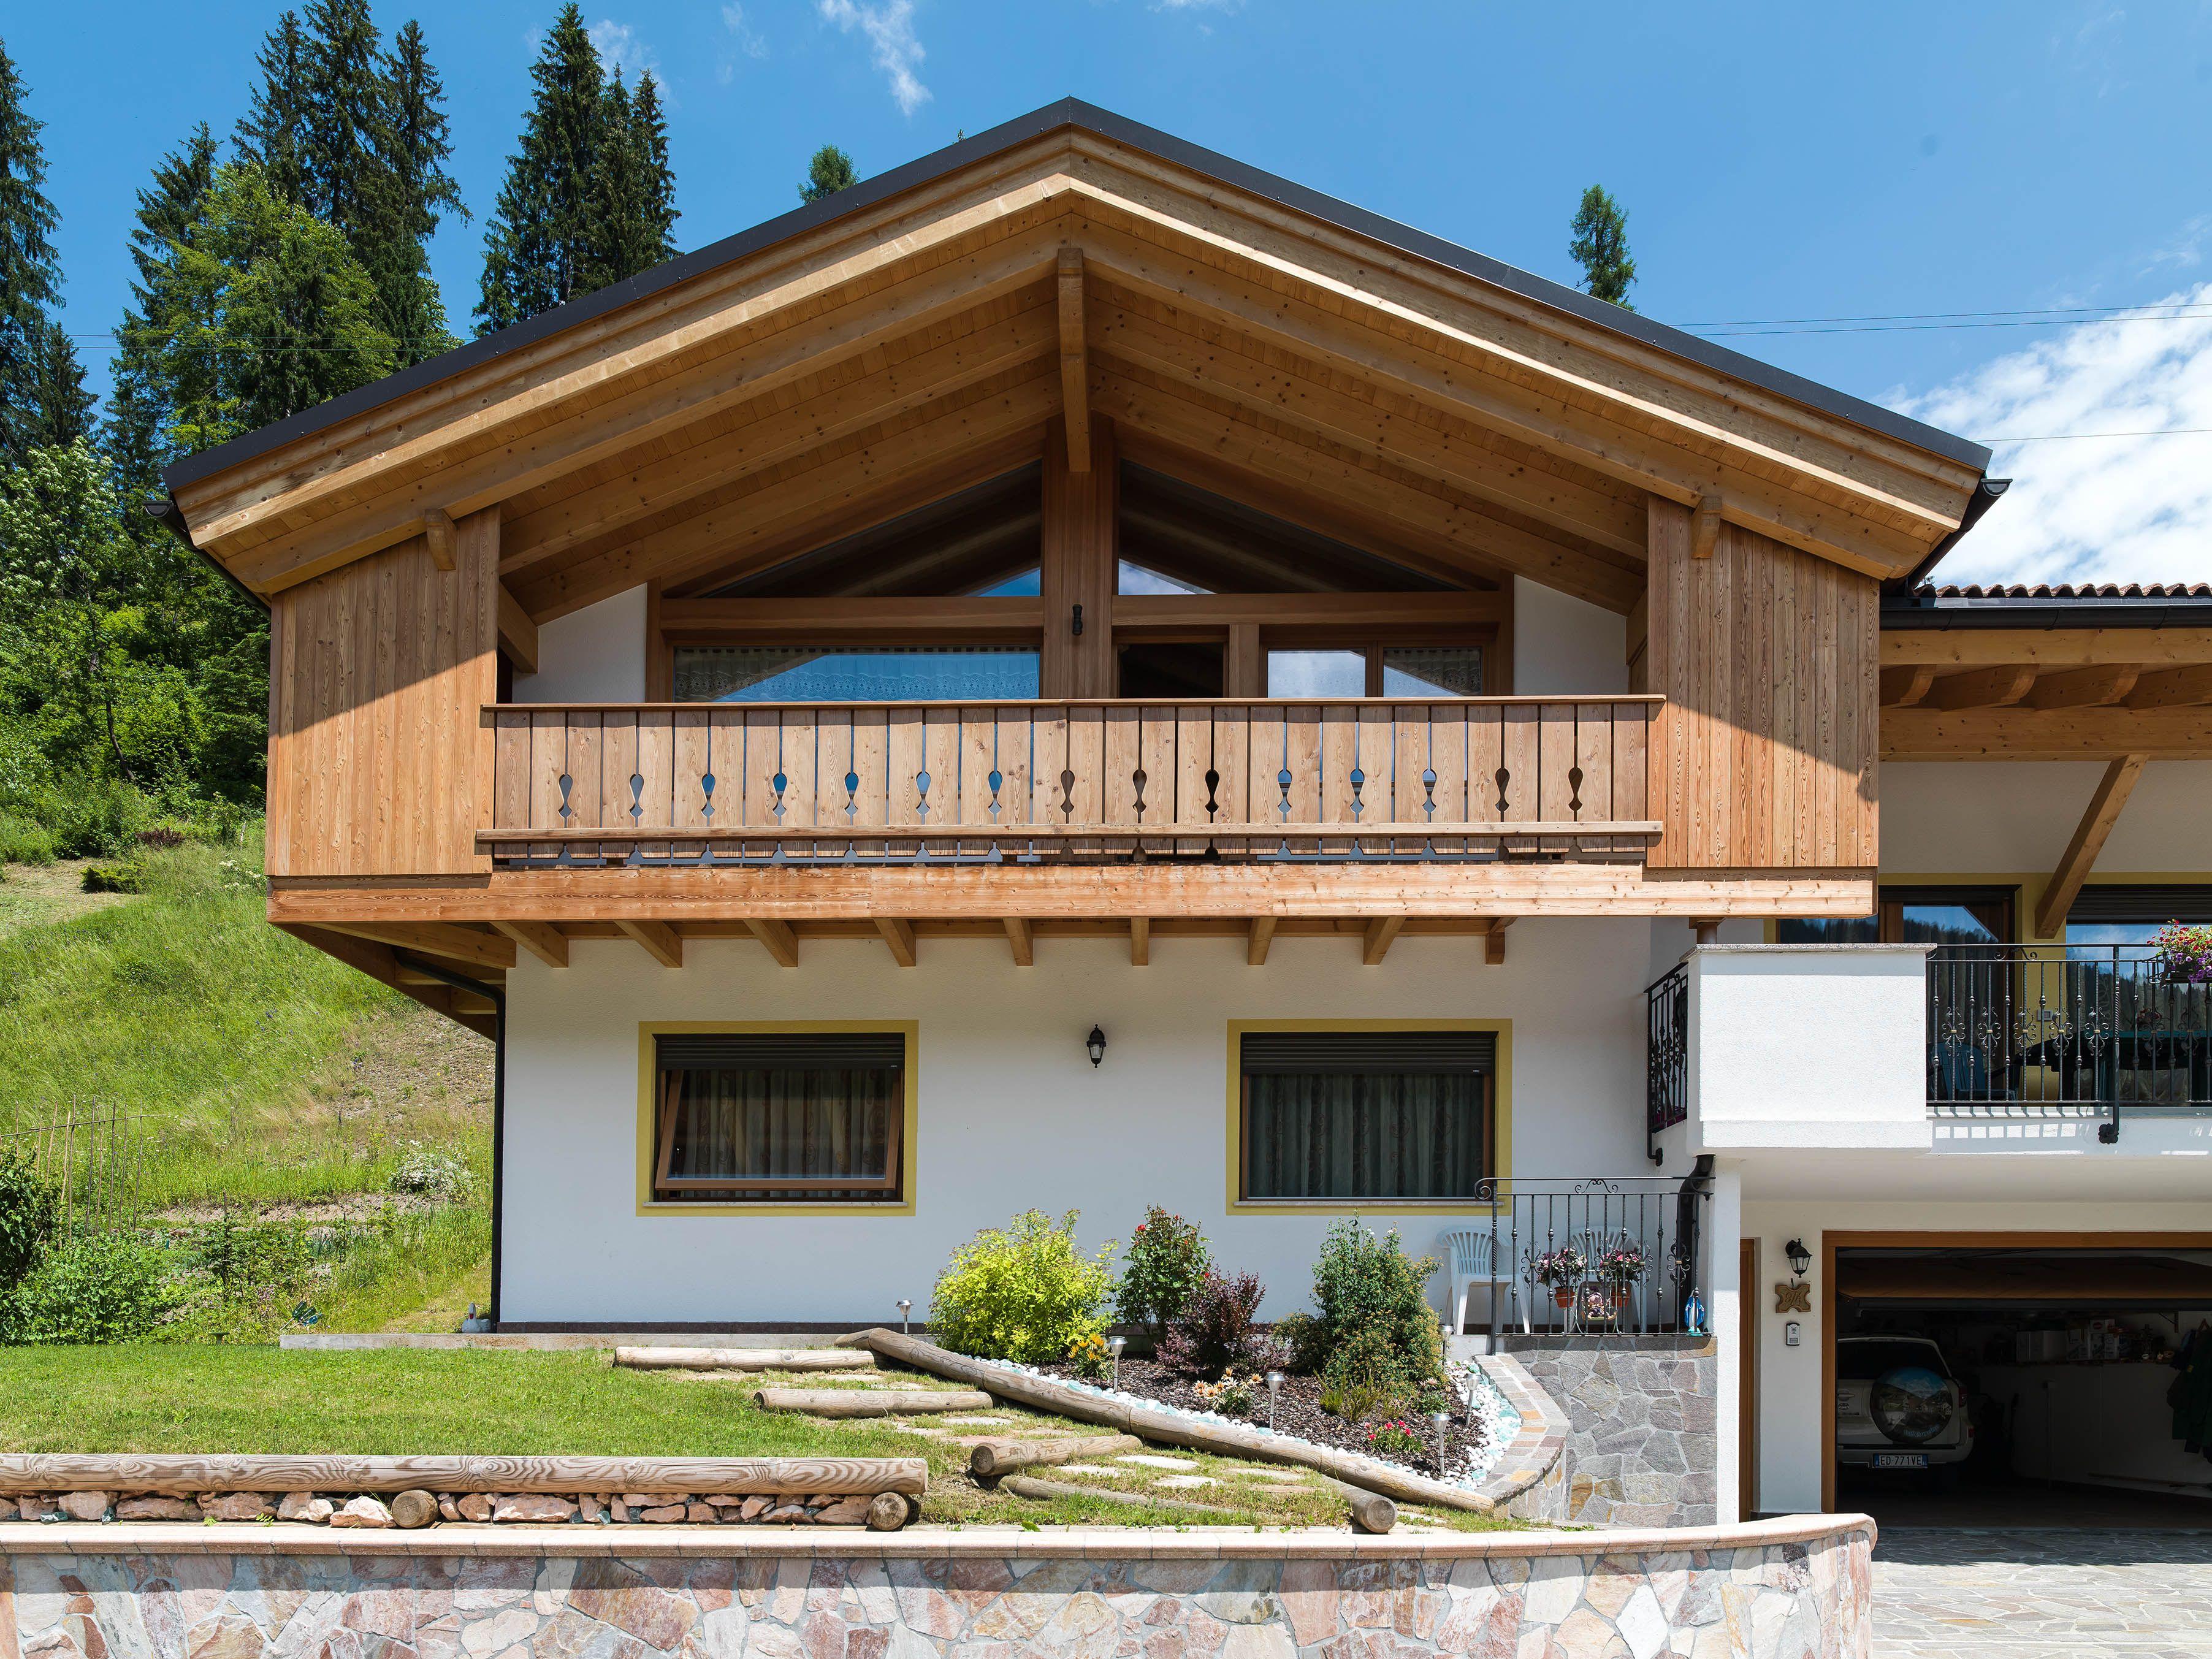 Design in legno Rubner Haus | Архитектура | Pinterest | Tyrol